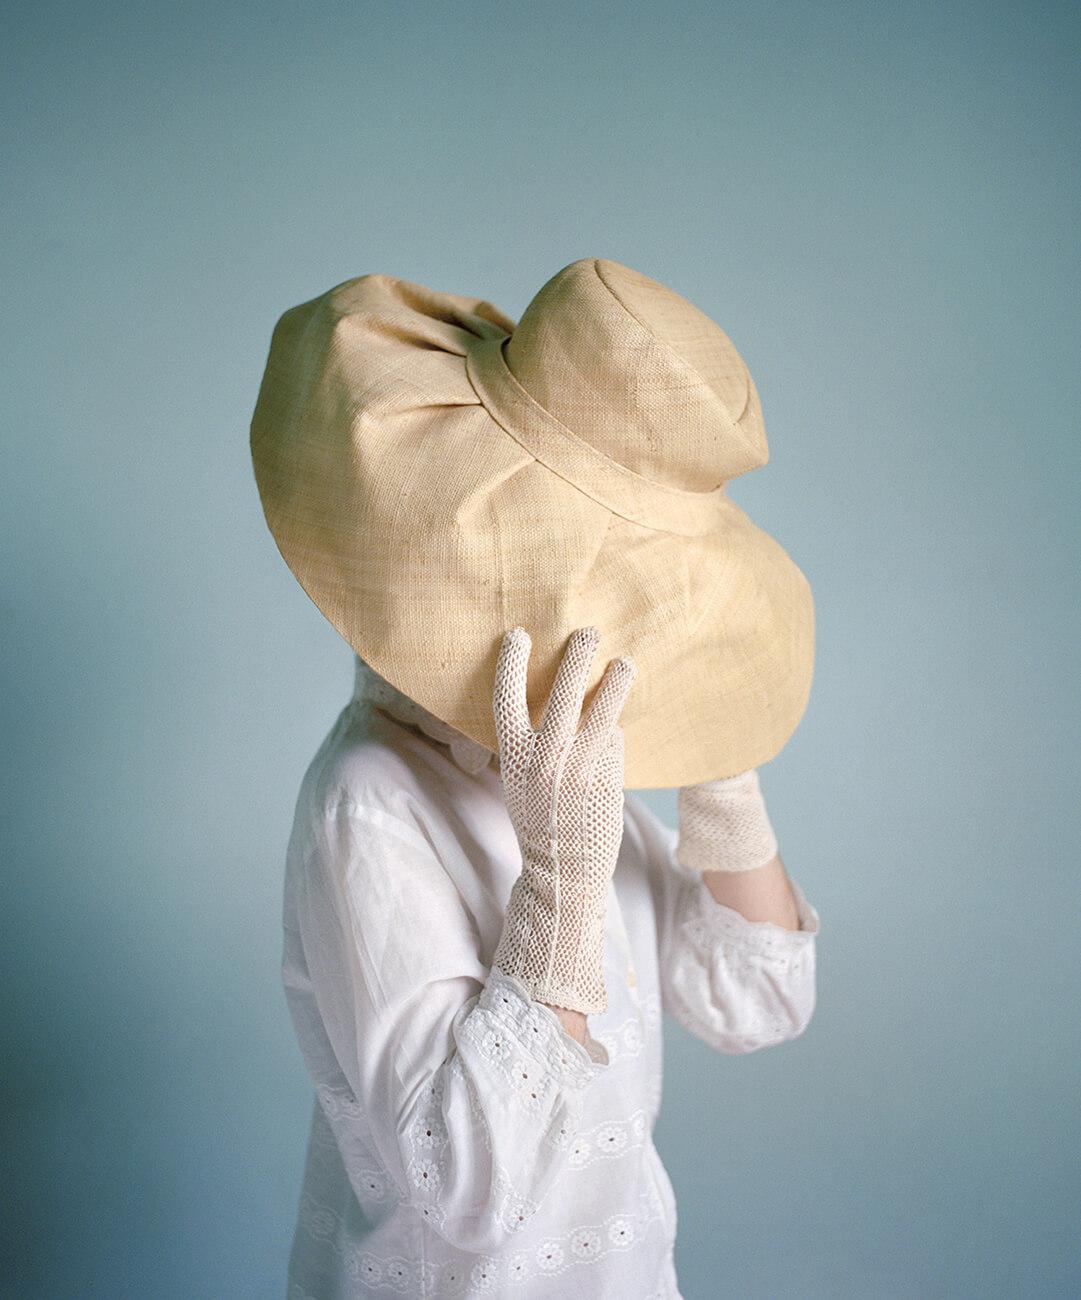 Marie Hudelot - Femme au Chapeau